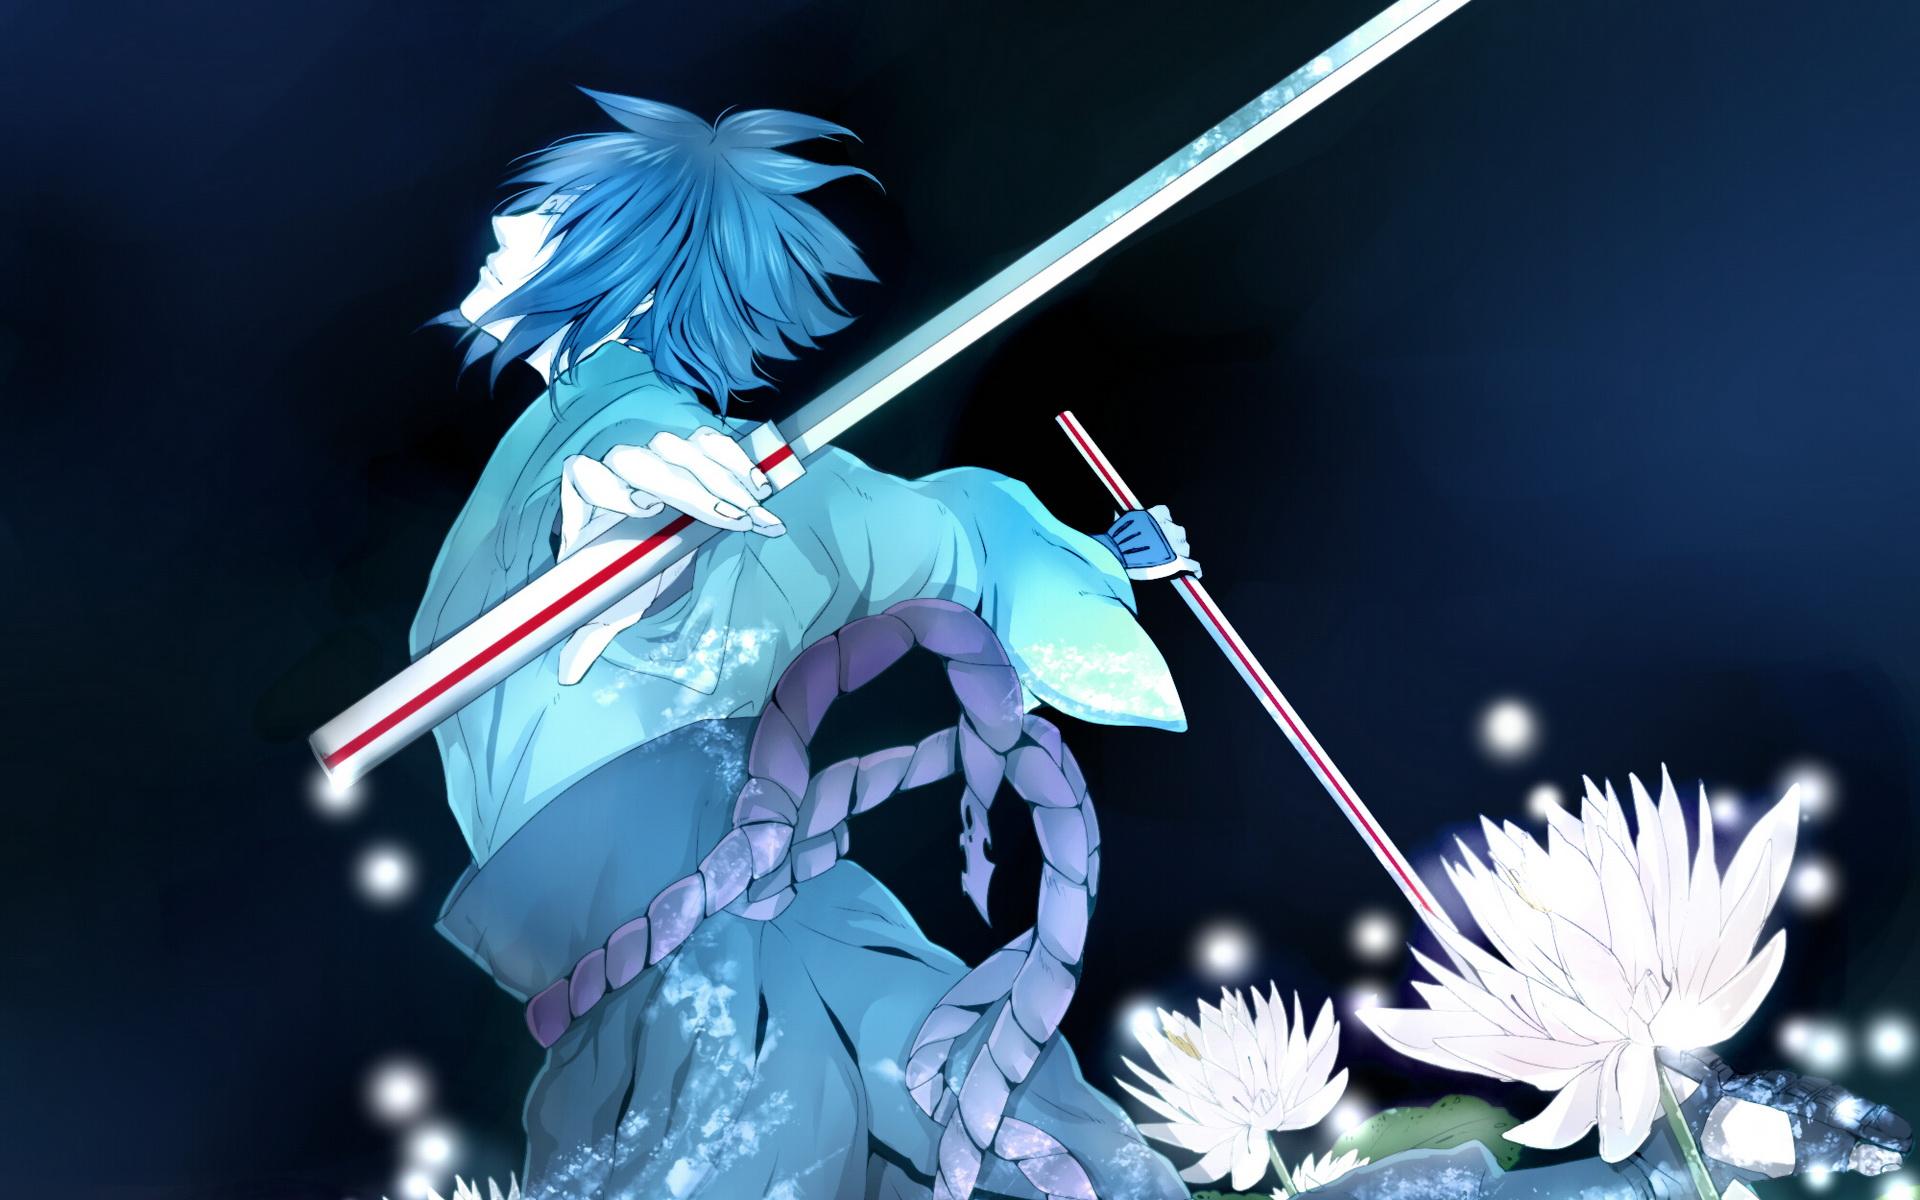 Naruto Uchiha sasuke Windows 81 Theme All for Windows 10 1920x1200